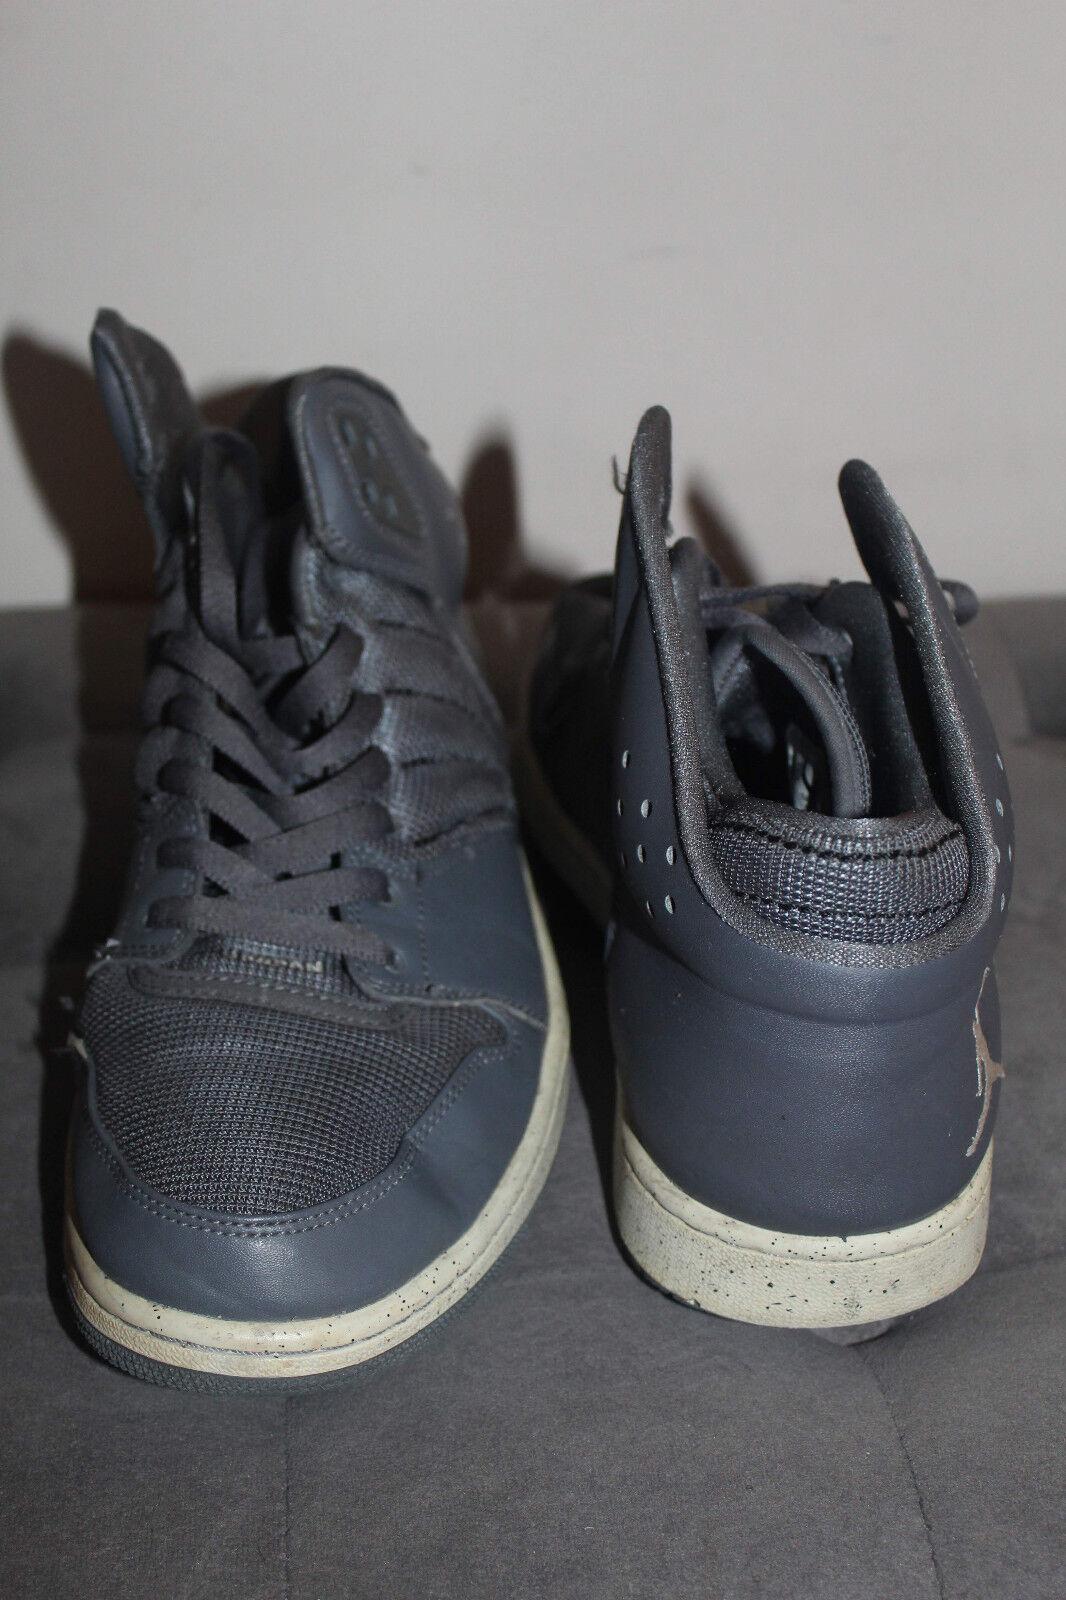 Cheap women's shoes women's shoes Nike Air Jordan 1 Flight 4 Mens Dark Grey Athletic Sneakers 838818-002 Comfortable